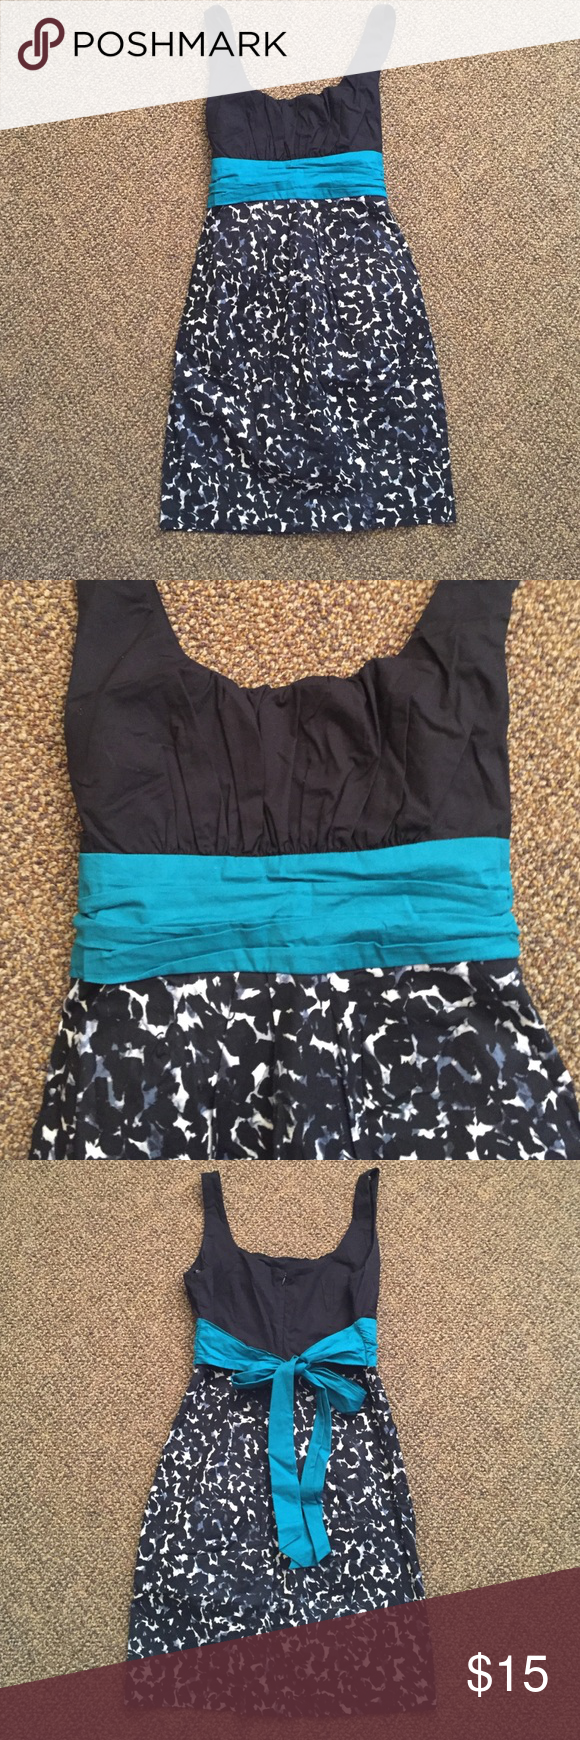 XOXO Dress Practically brand new! Worn twice. Great shape little cocktail dress XOXO Dresses Mini